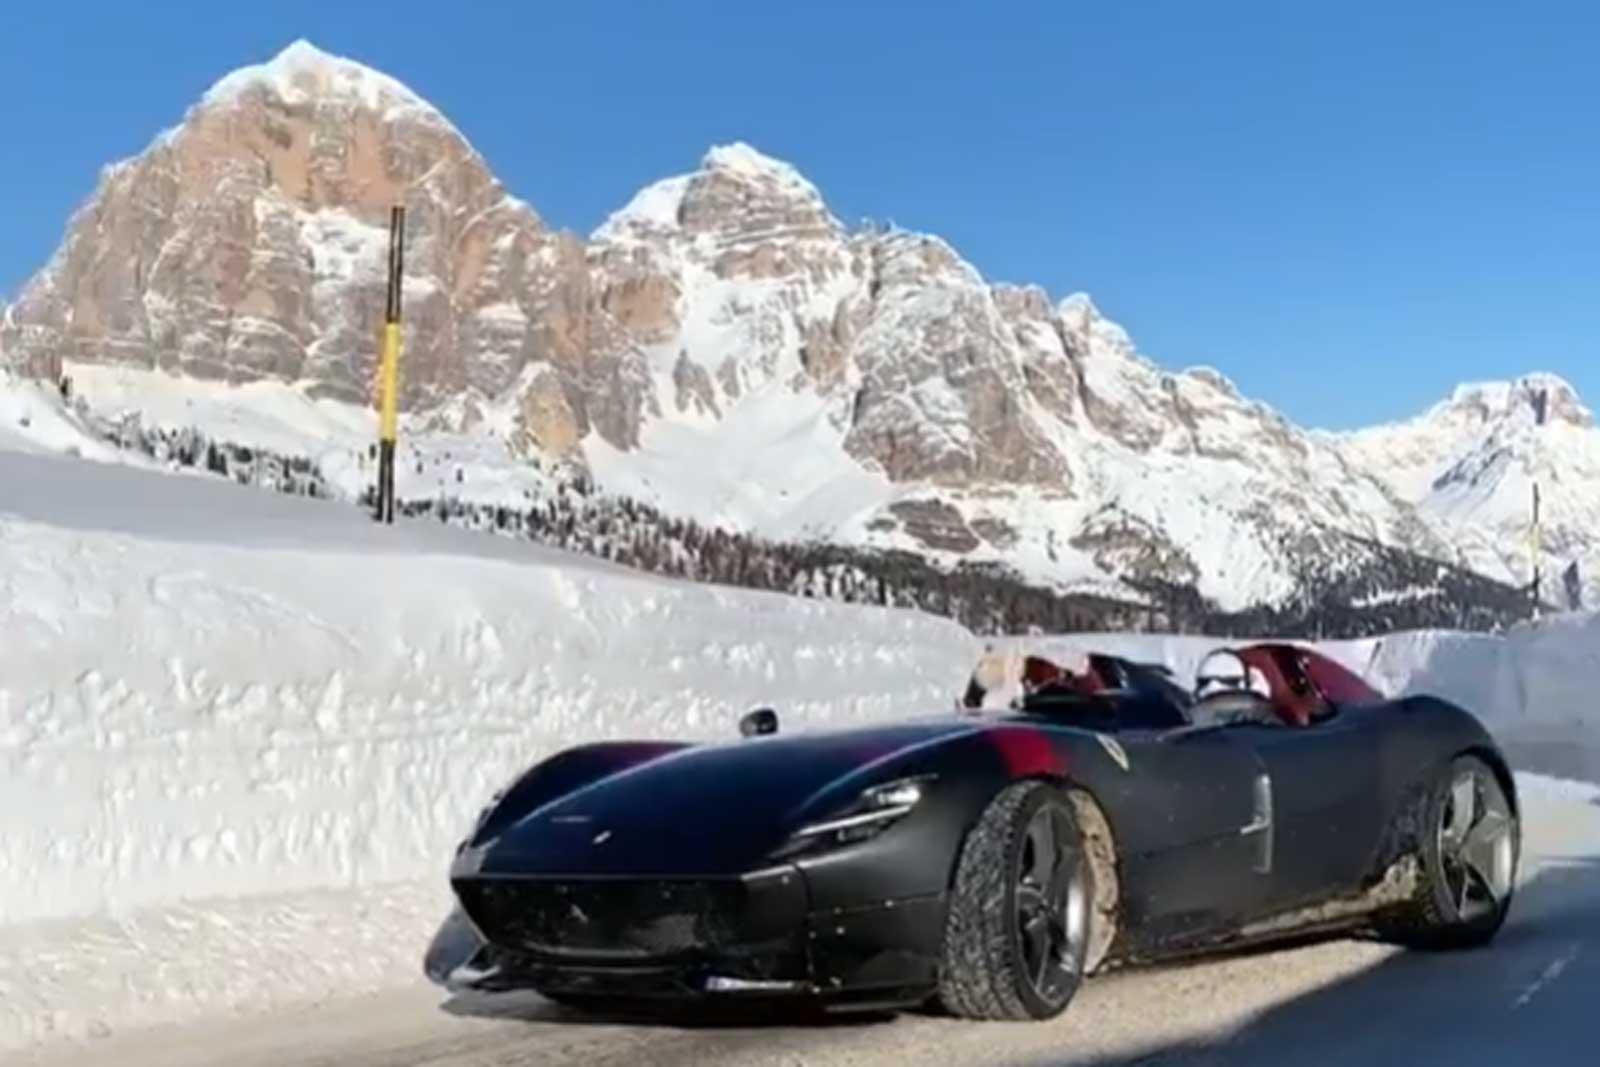 Ferrari Monza SP2 in the Snow